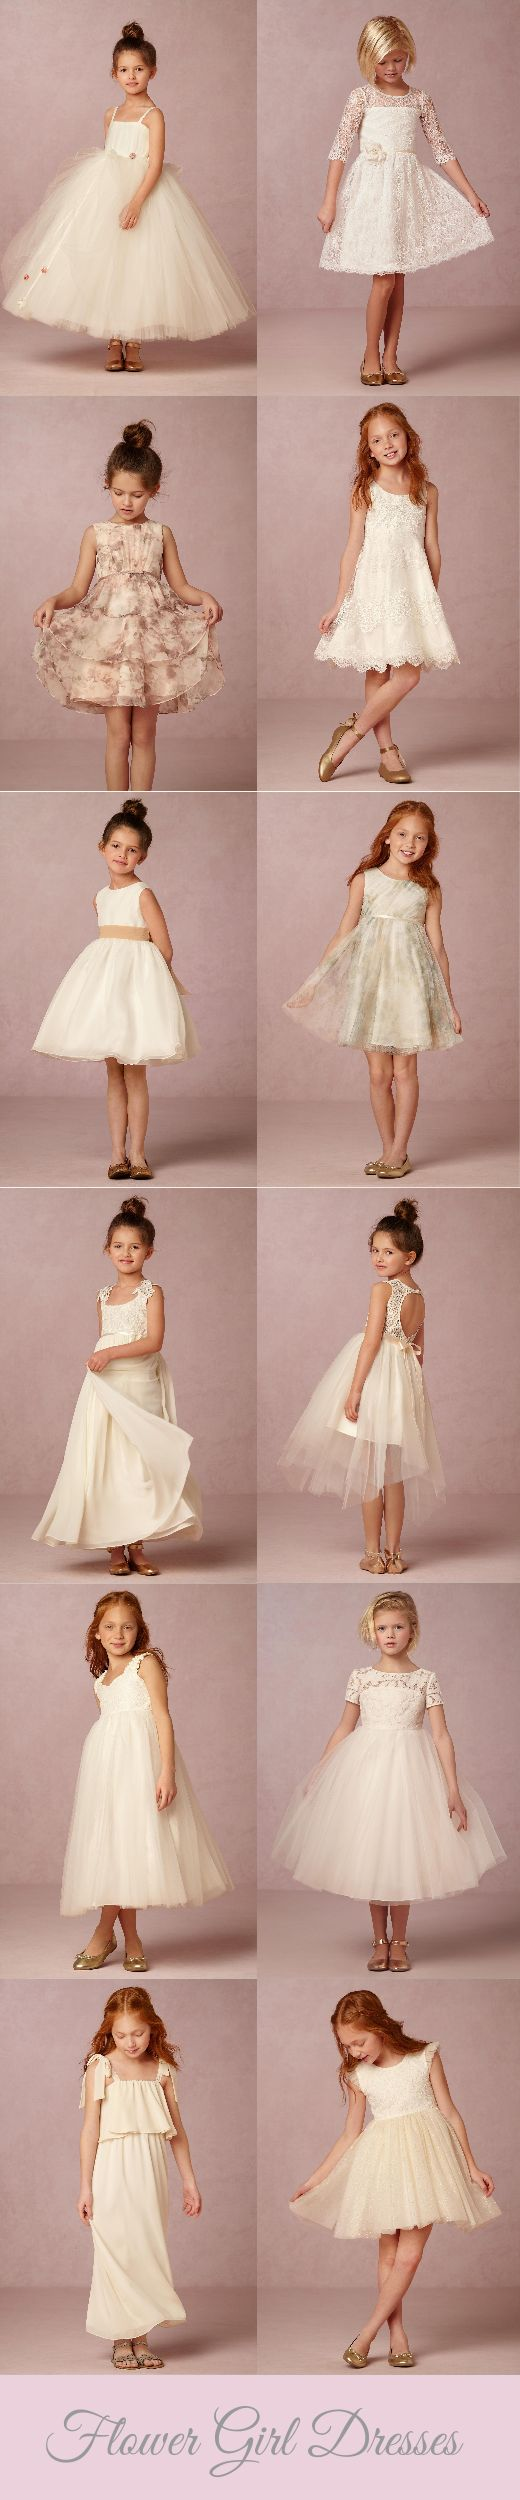 100 best Flower Girl Dresses images on Pinterest   Bridesmaids ...